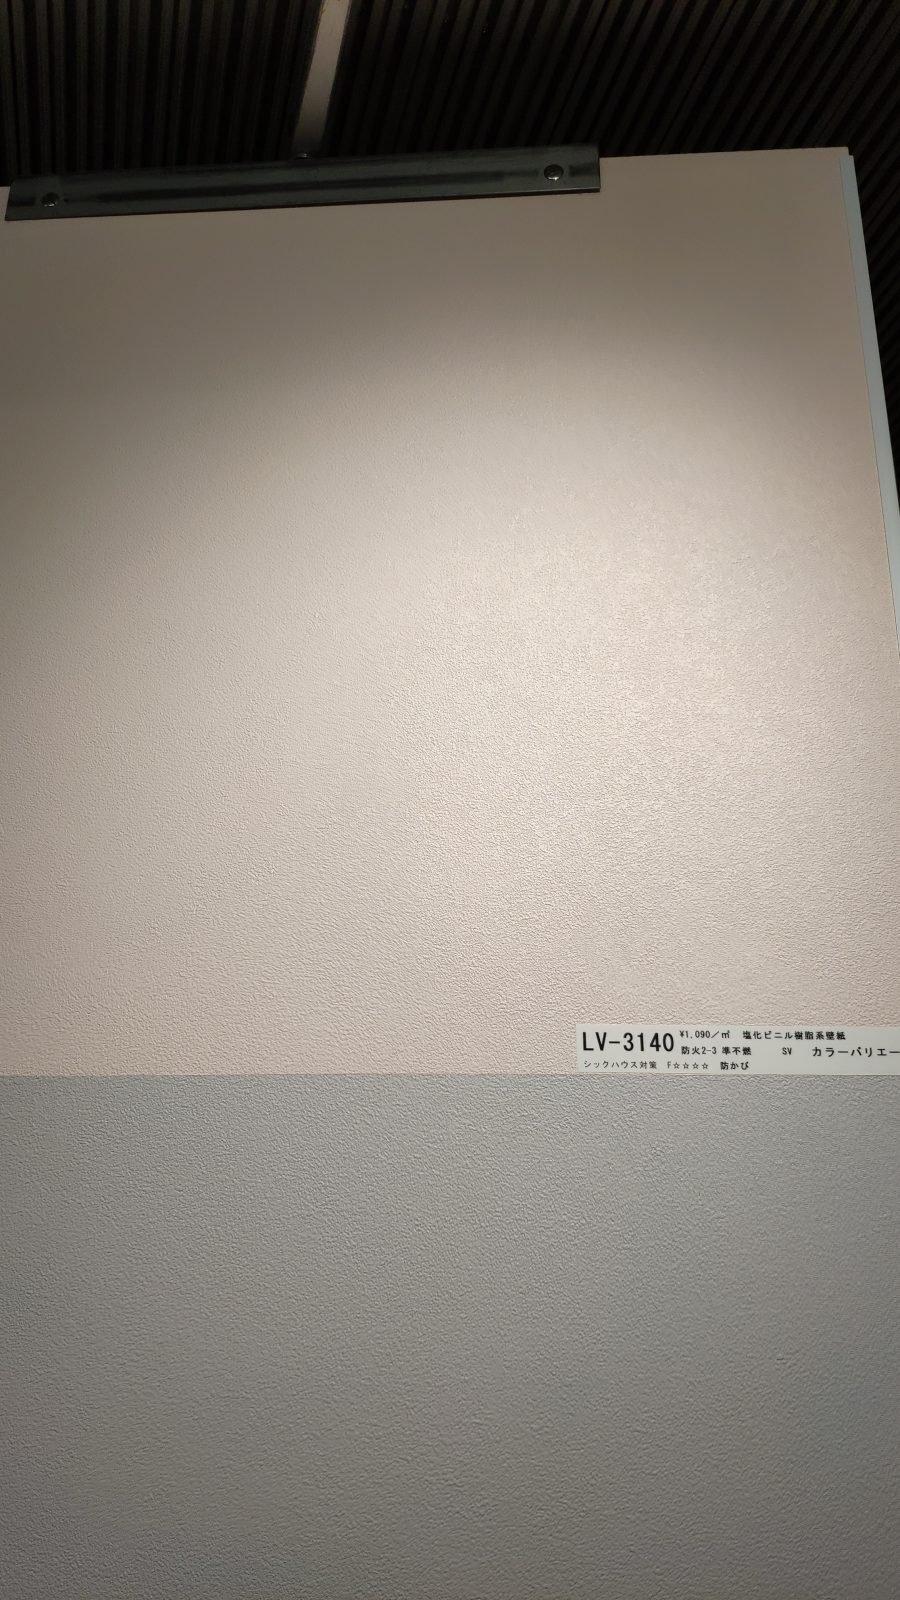 LV-3140(LTS408) / LV-3141